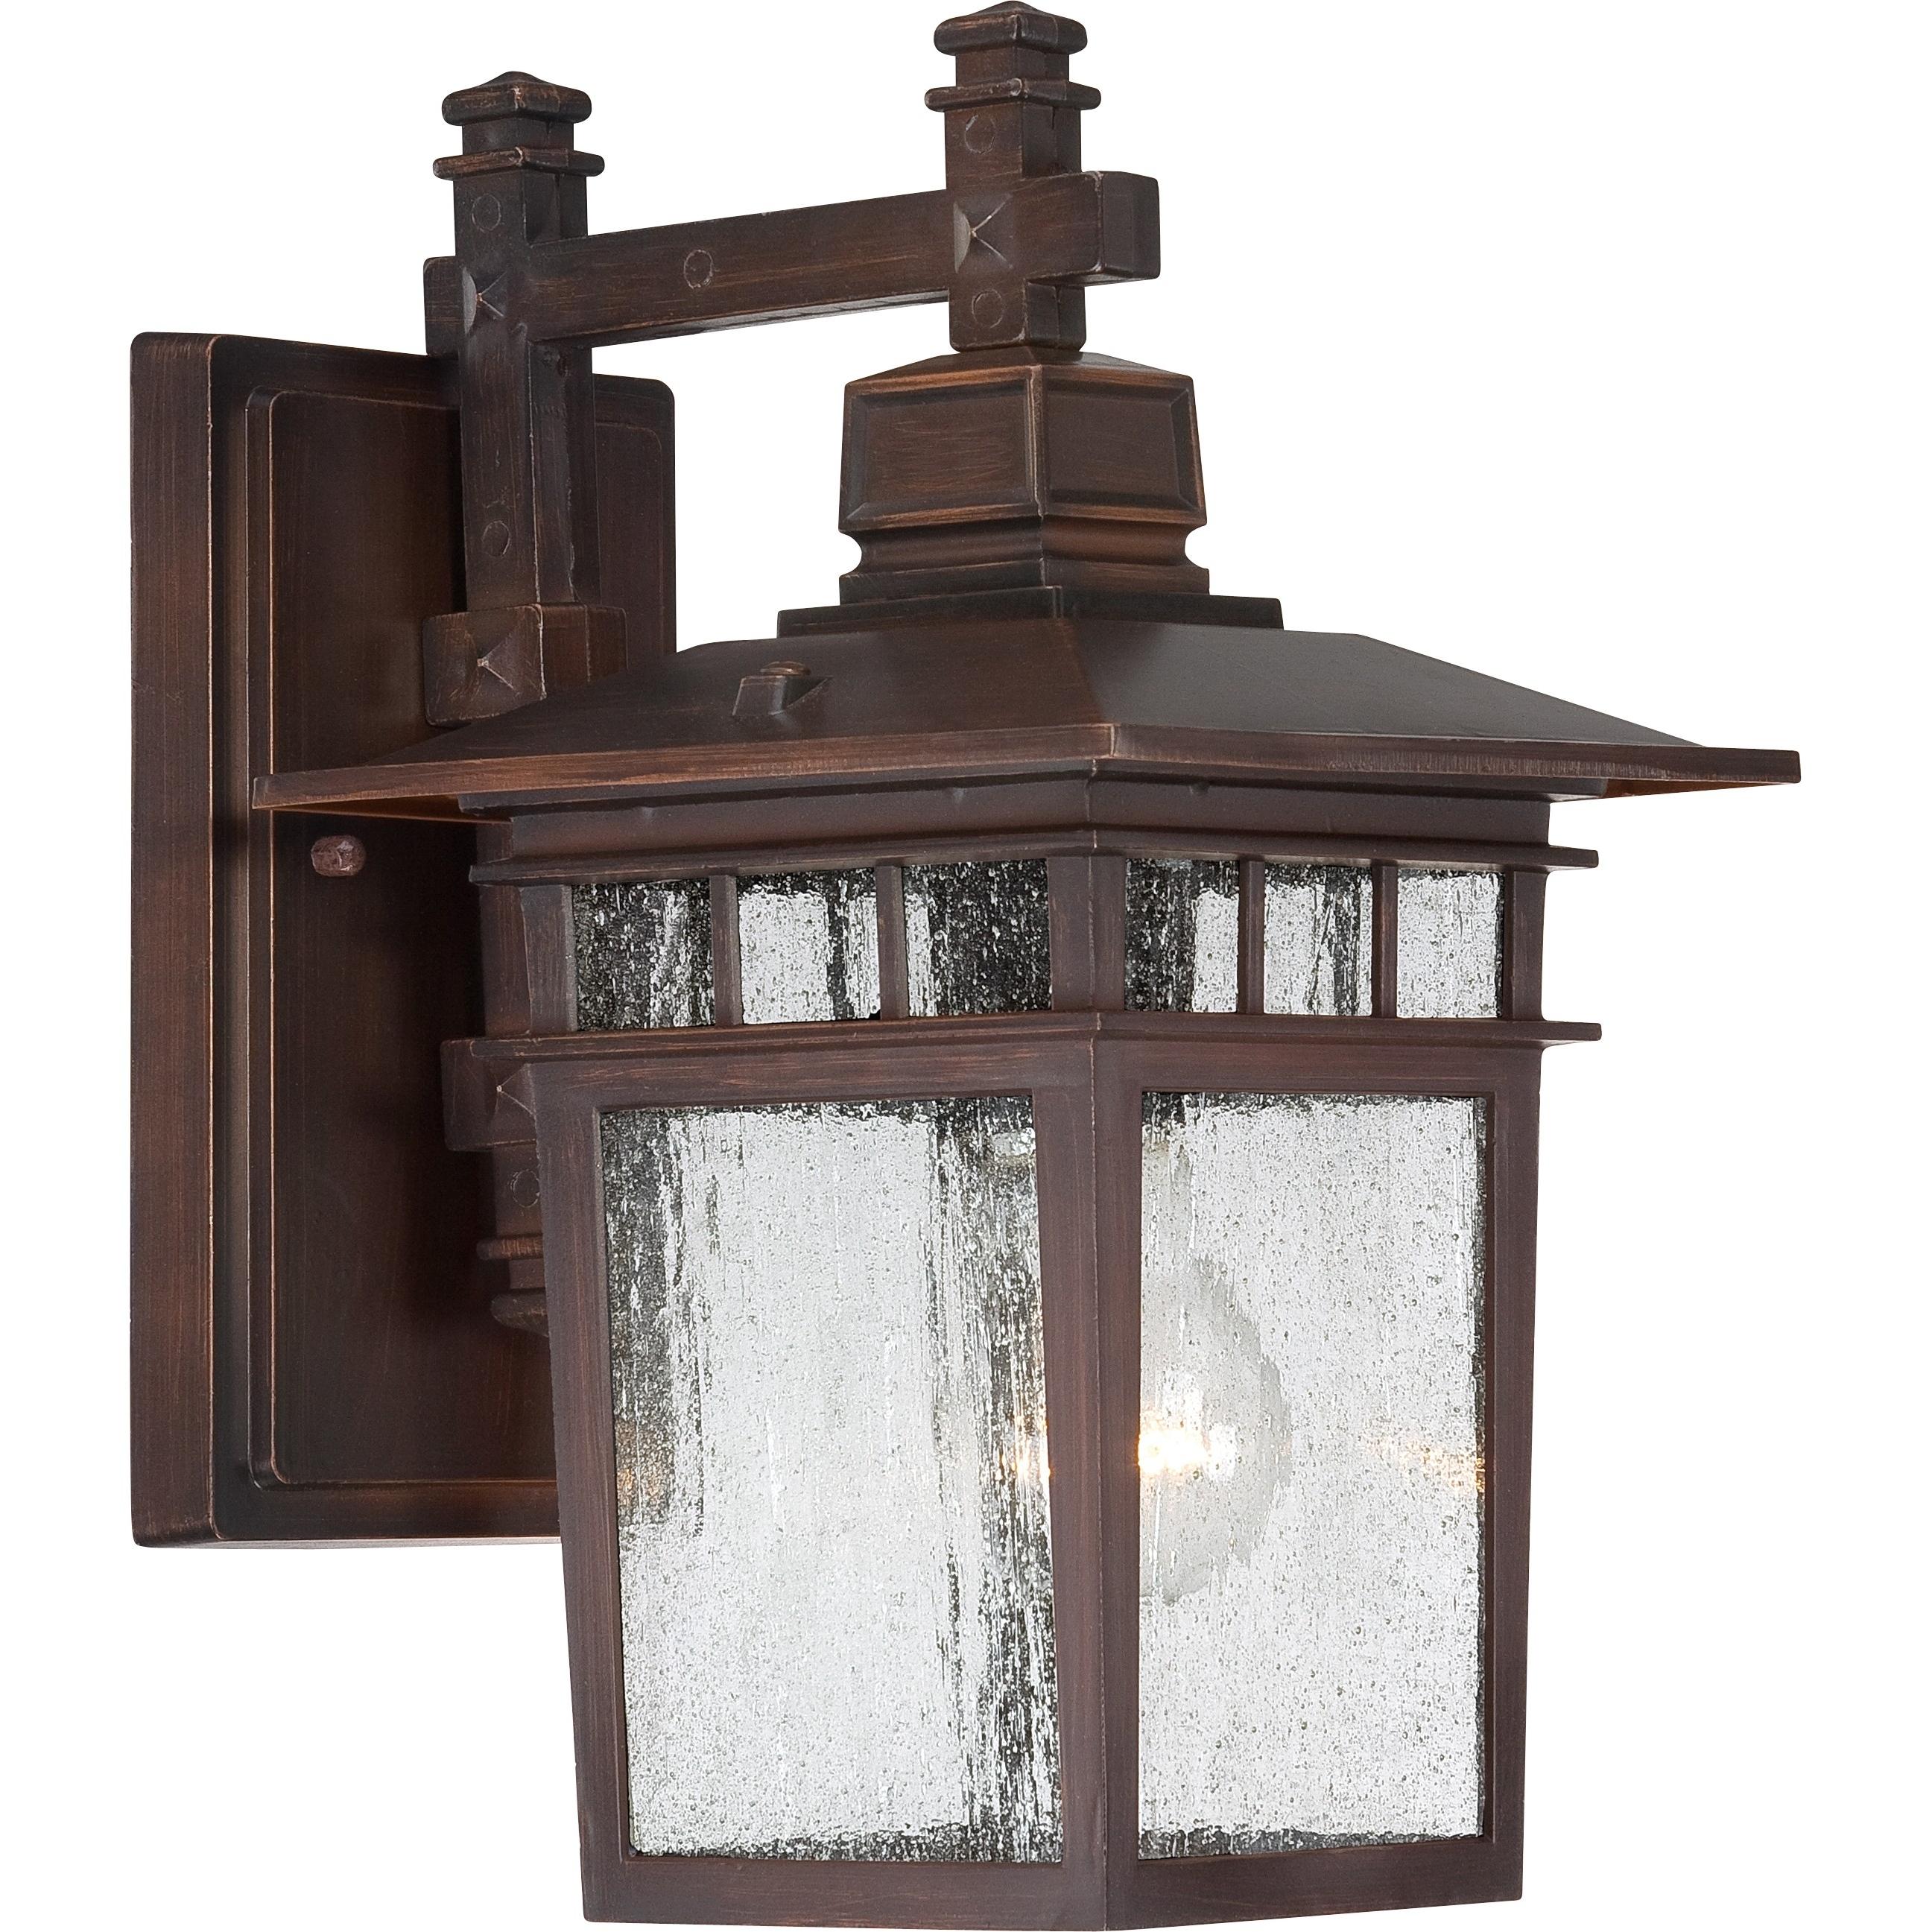 Widely Used Lighting : Rustic Outdoor Lighting Impressive Photos Design Home Regarding Modern Rustic Outdoor Lighting Att Wayfair (View 20 of 20)